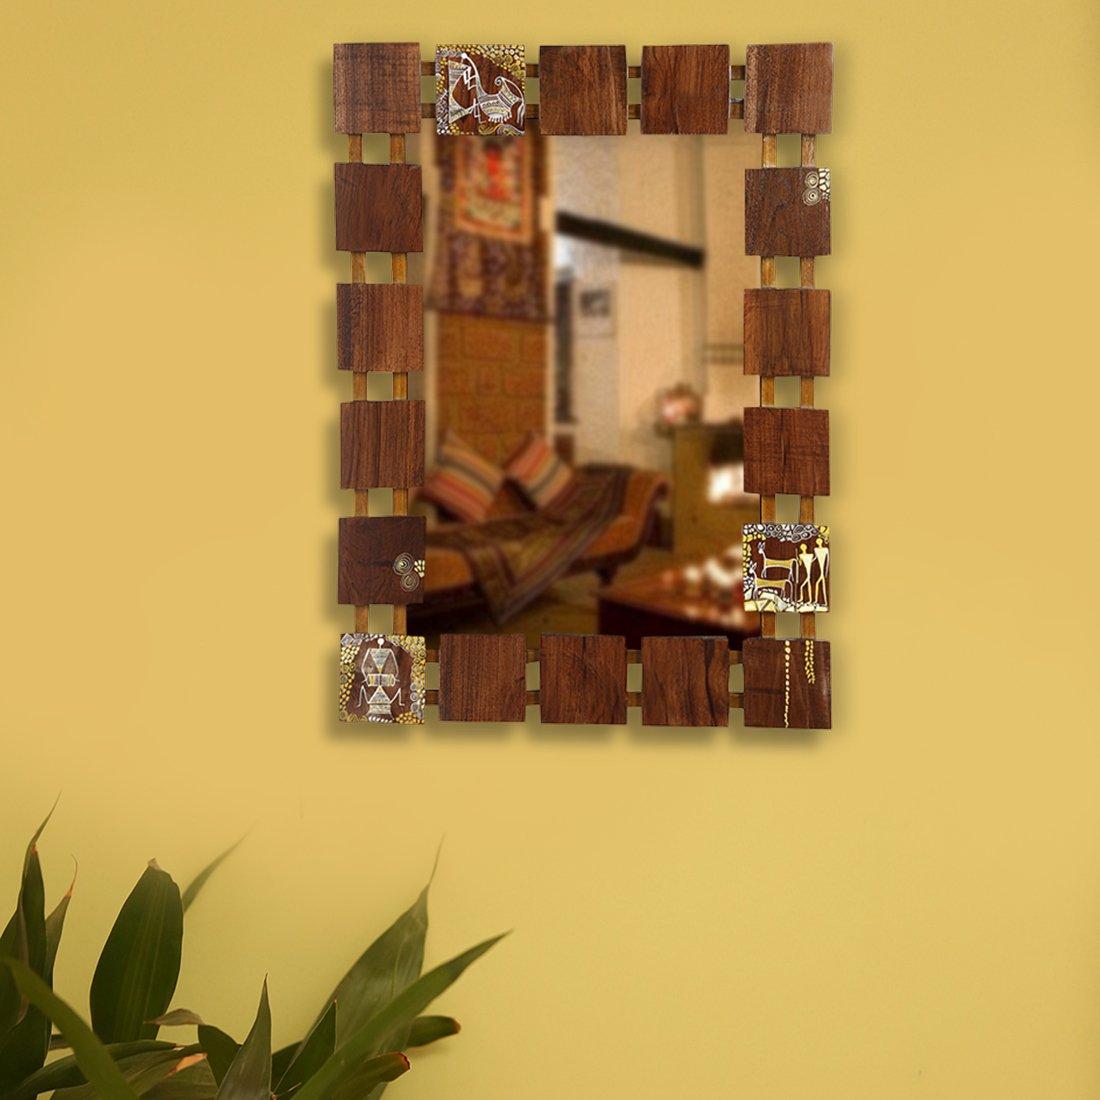 Buy ExclusiveLane Wooden Wall Mirror with Warli Art - Wall Hanging ...